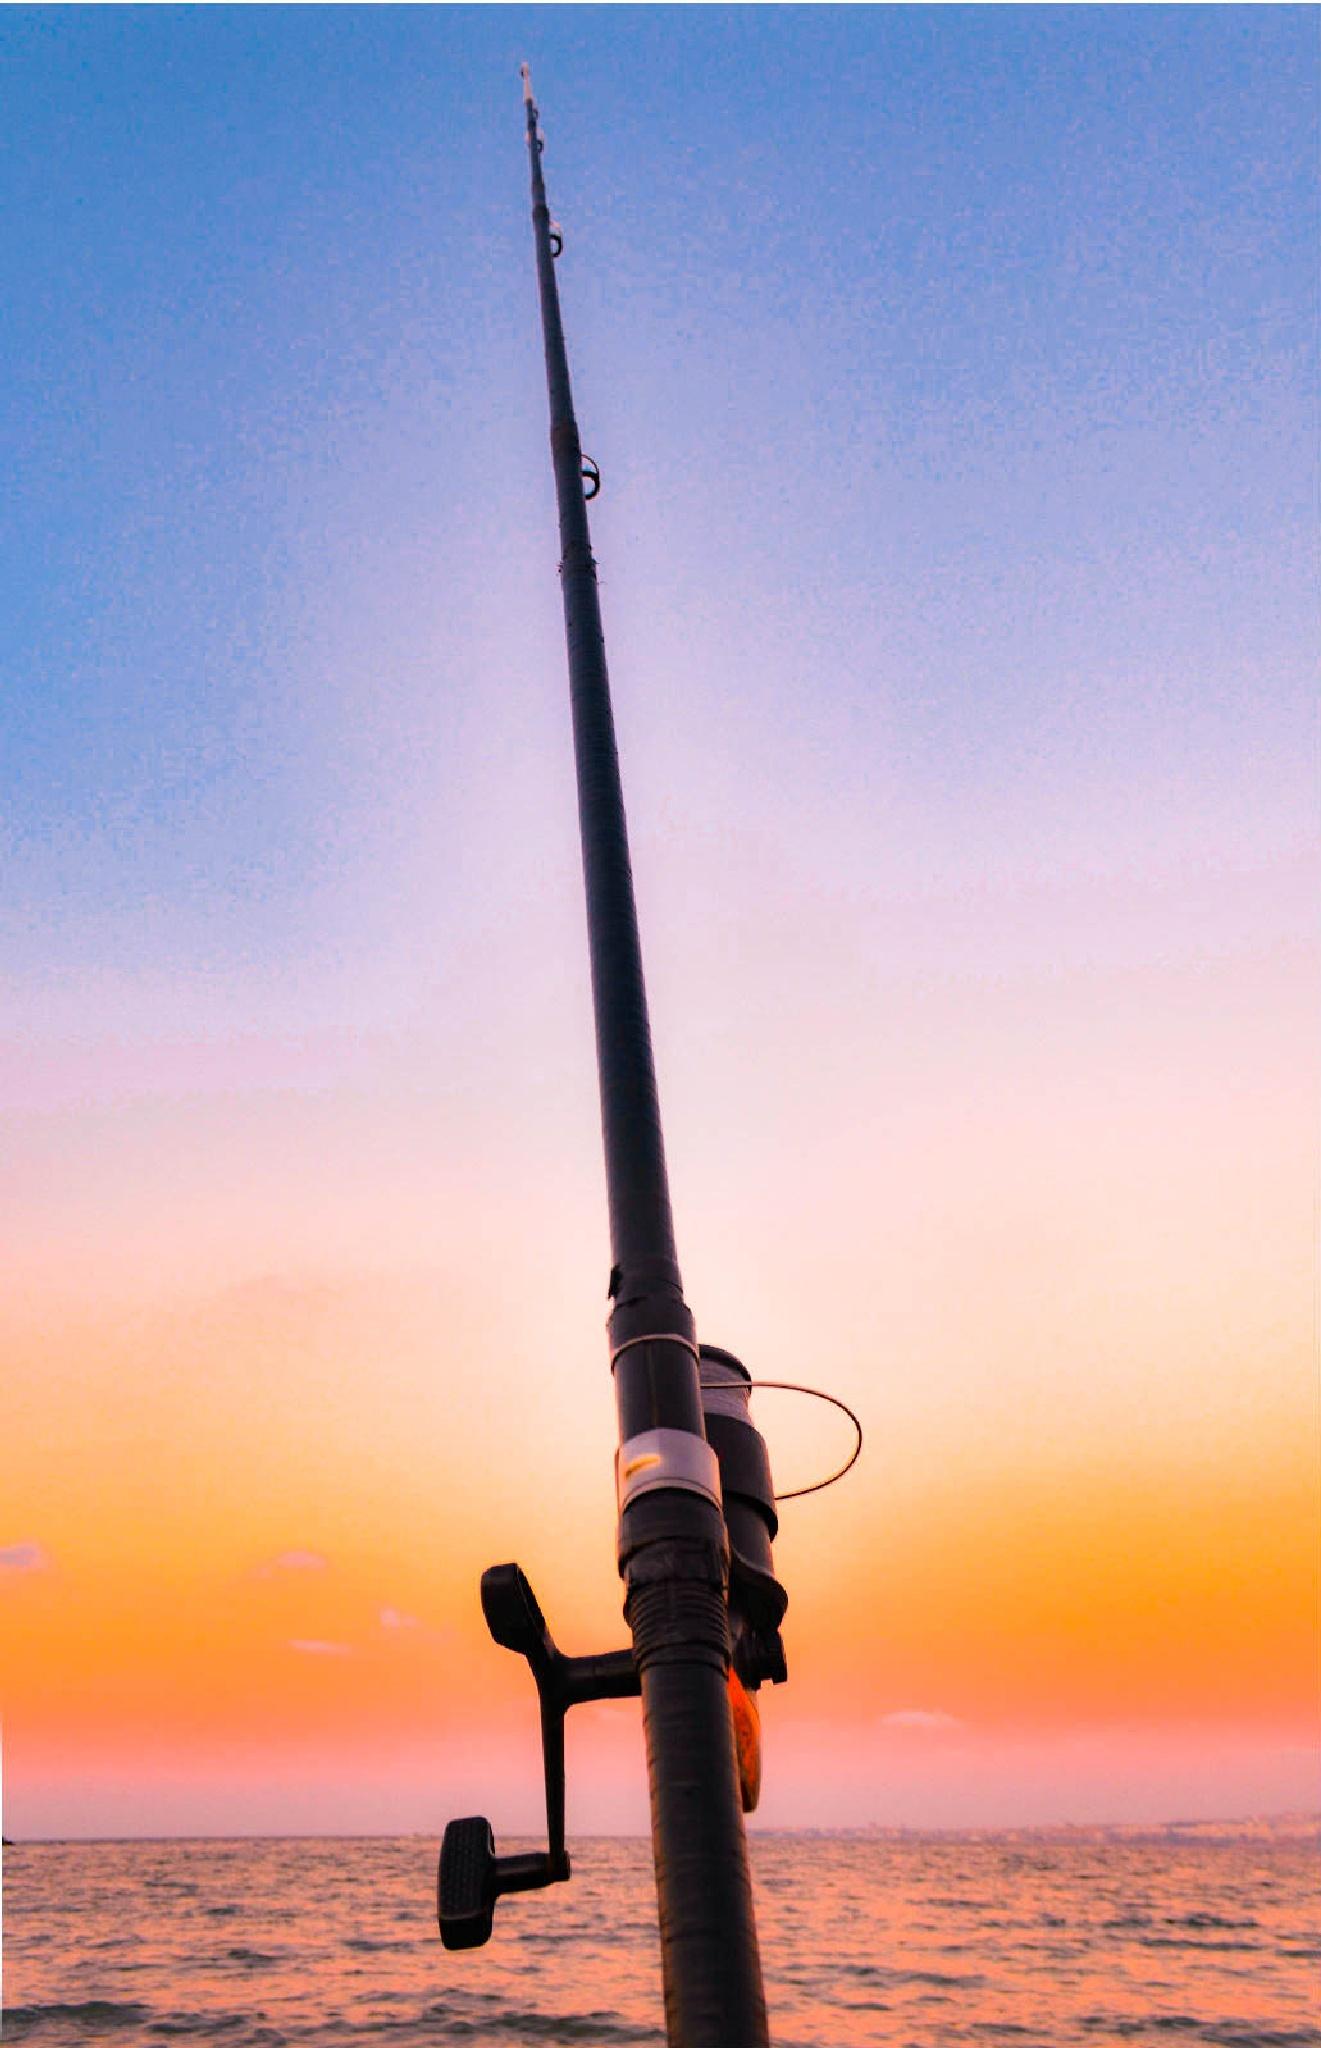 fishing by Abderahmane